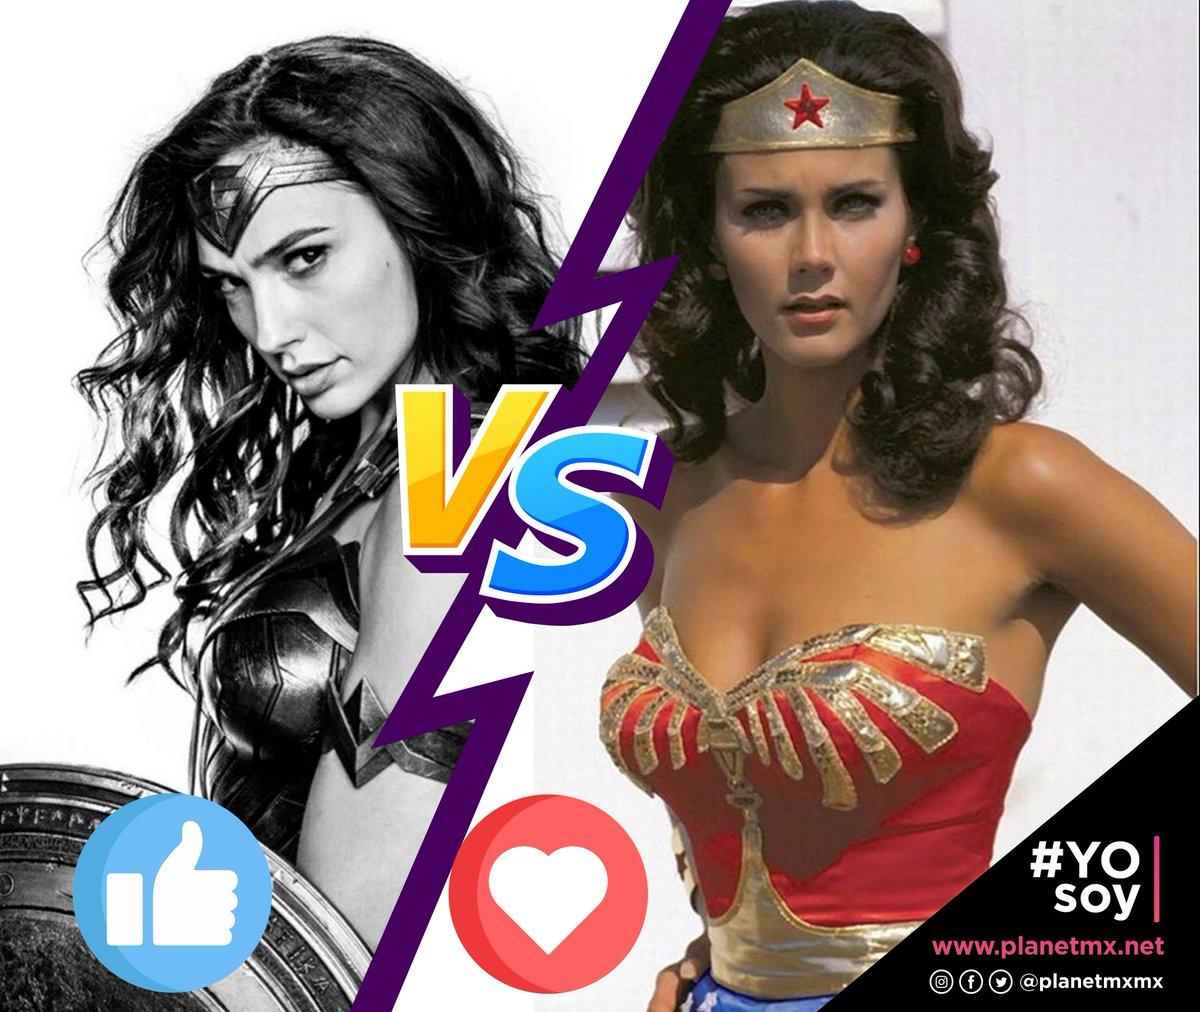 ¿Cúal es tu favorita? #YOsoy #WonderWoman #DC #Princes #superhéroe #playeras #GalGadot #LyndaCarter #FelizJueves😊 https://t.co/1J2jqNcocA